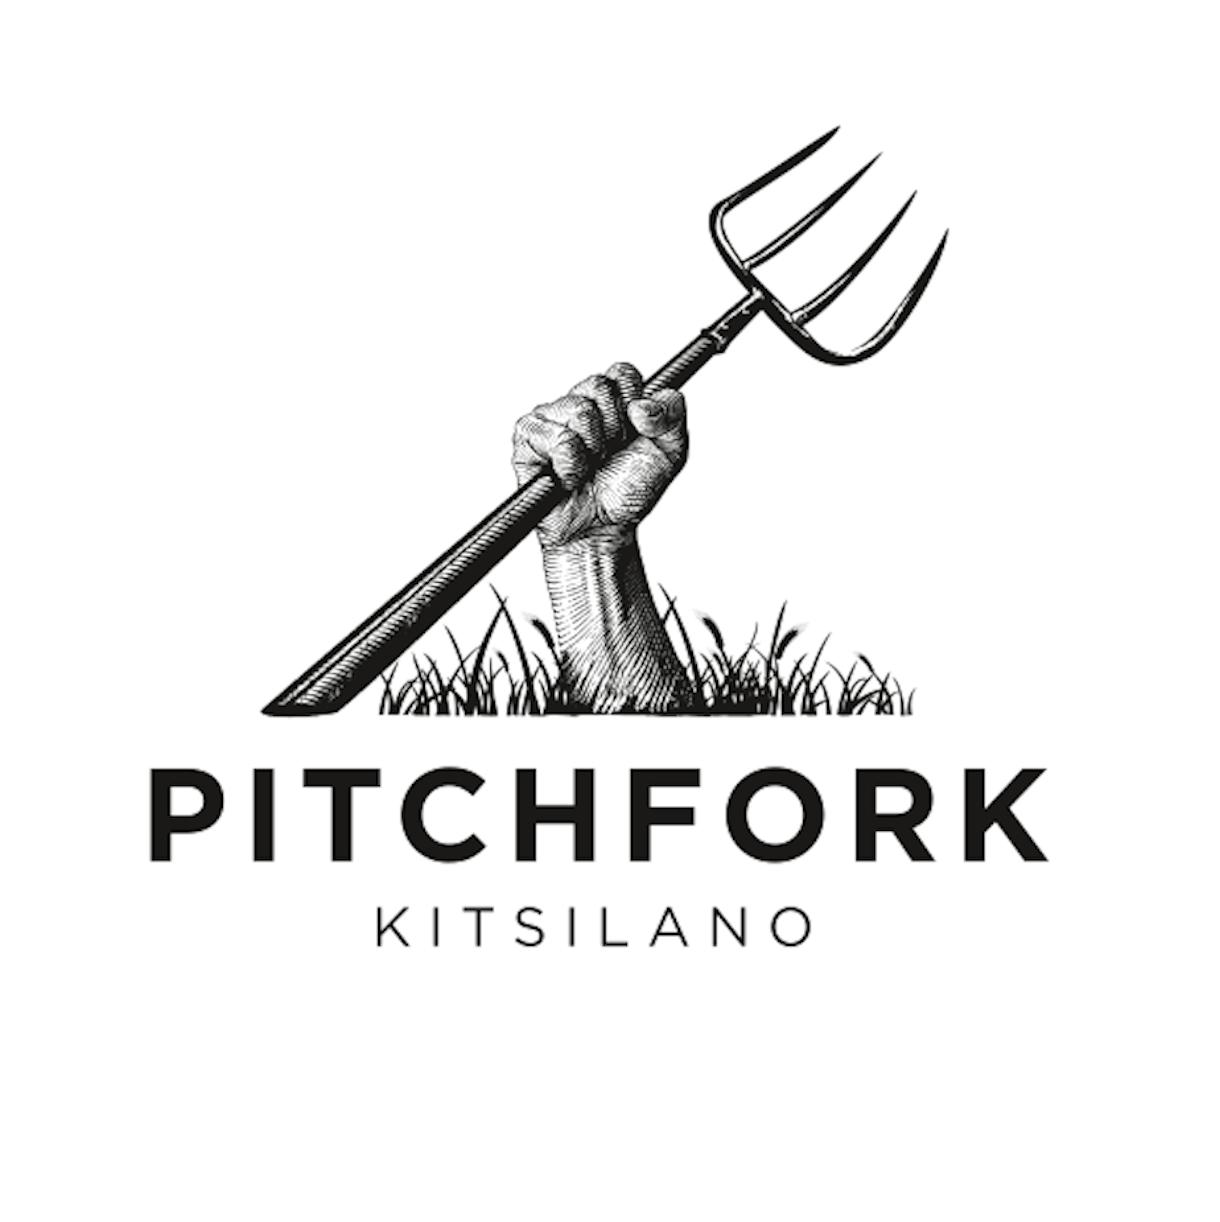 Pitchfork Restaurant opening